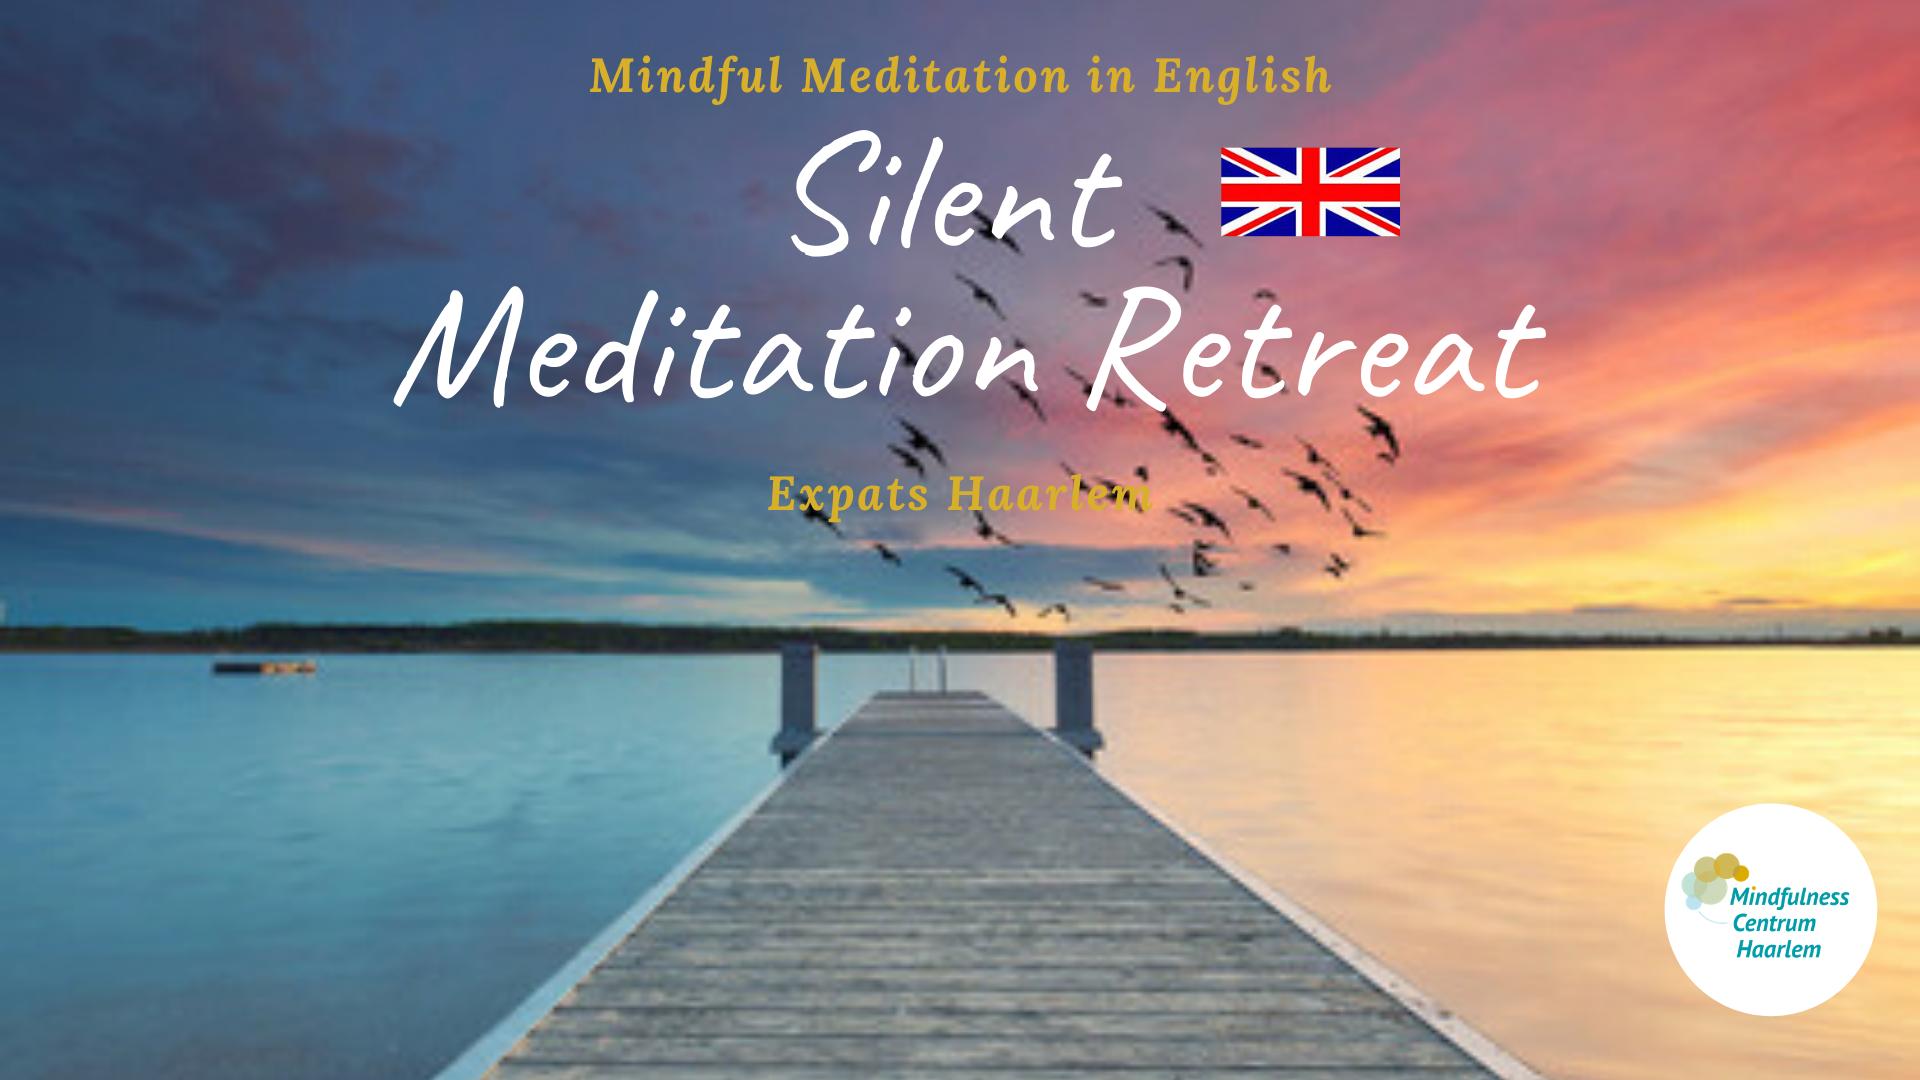 Silent Meditation Retreat in English Haarlem